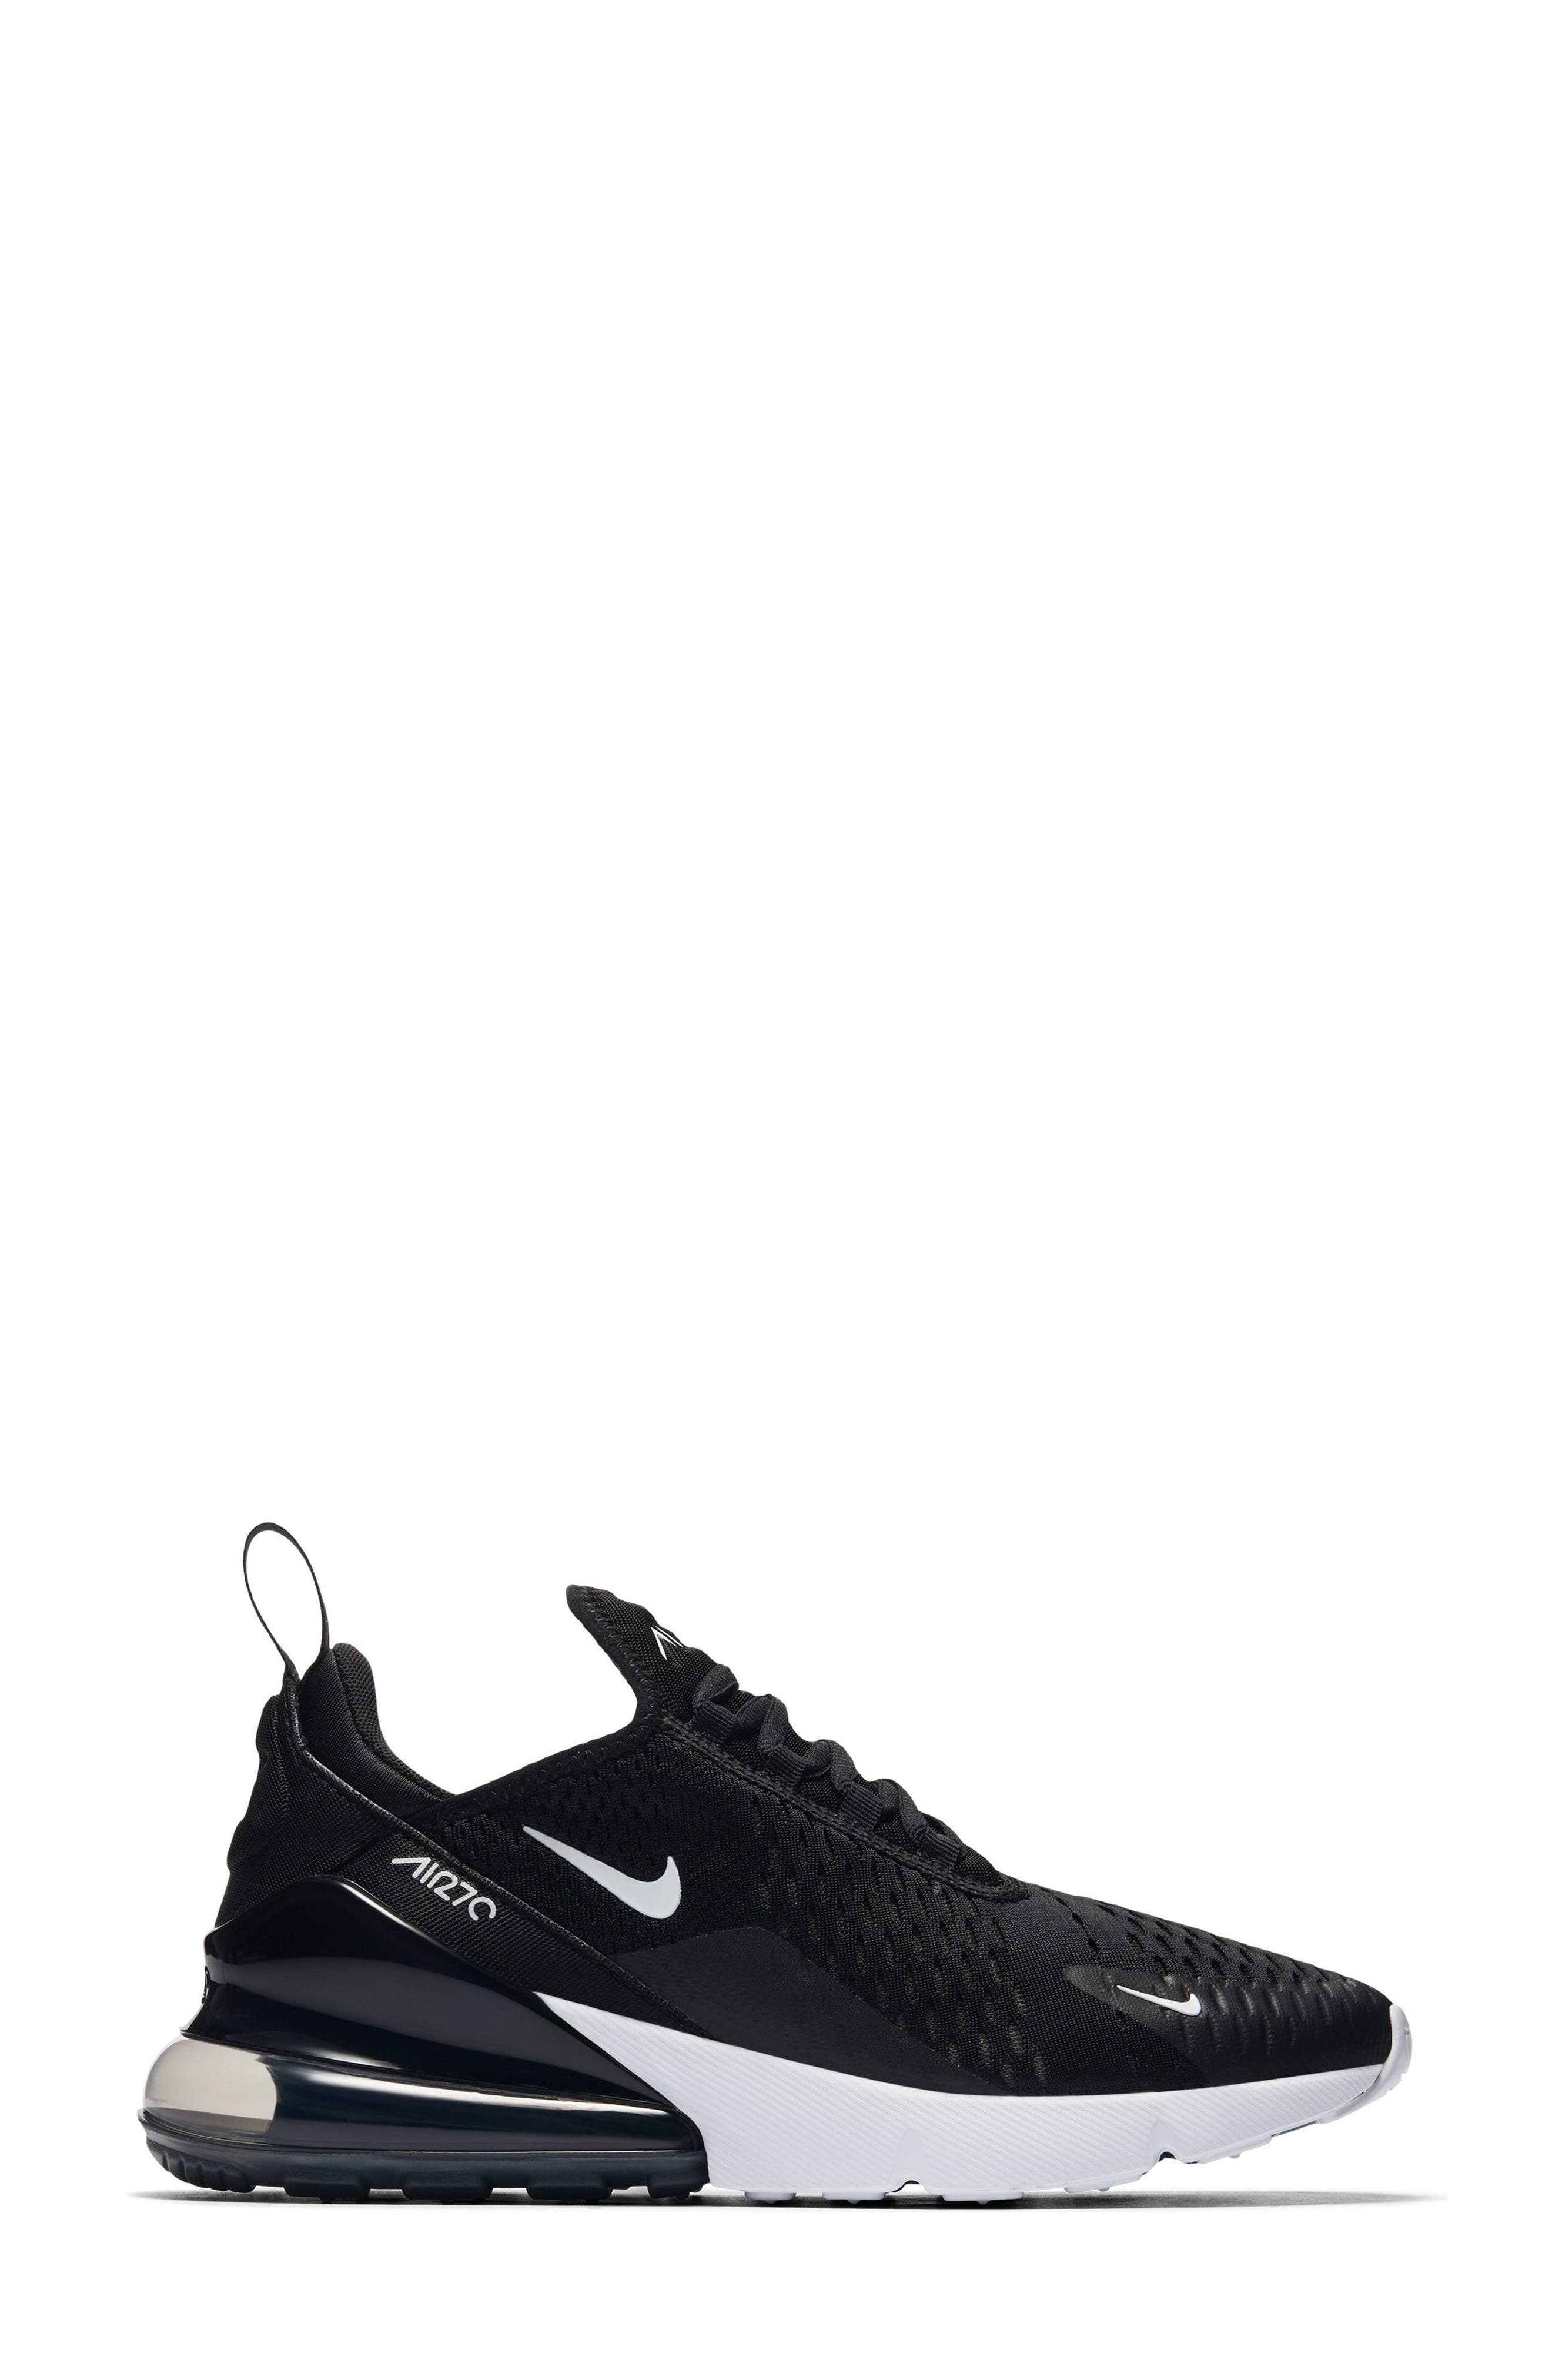 Air Max 270 Sneaker,                             Alternate thumbnail 2, color,                             Black/ Anthracite/ White